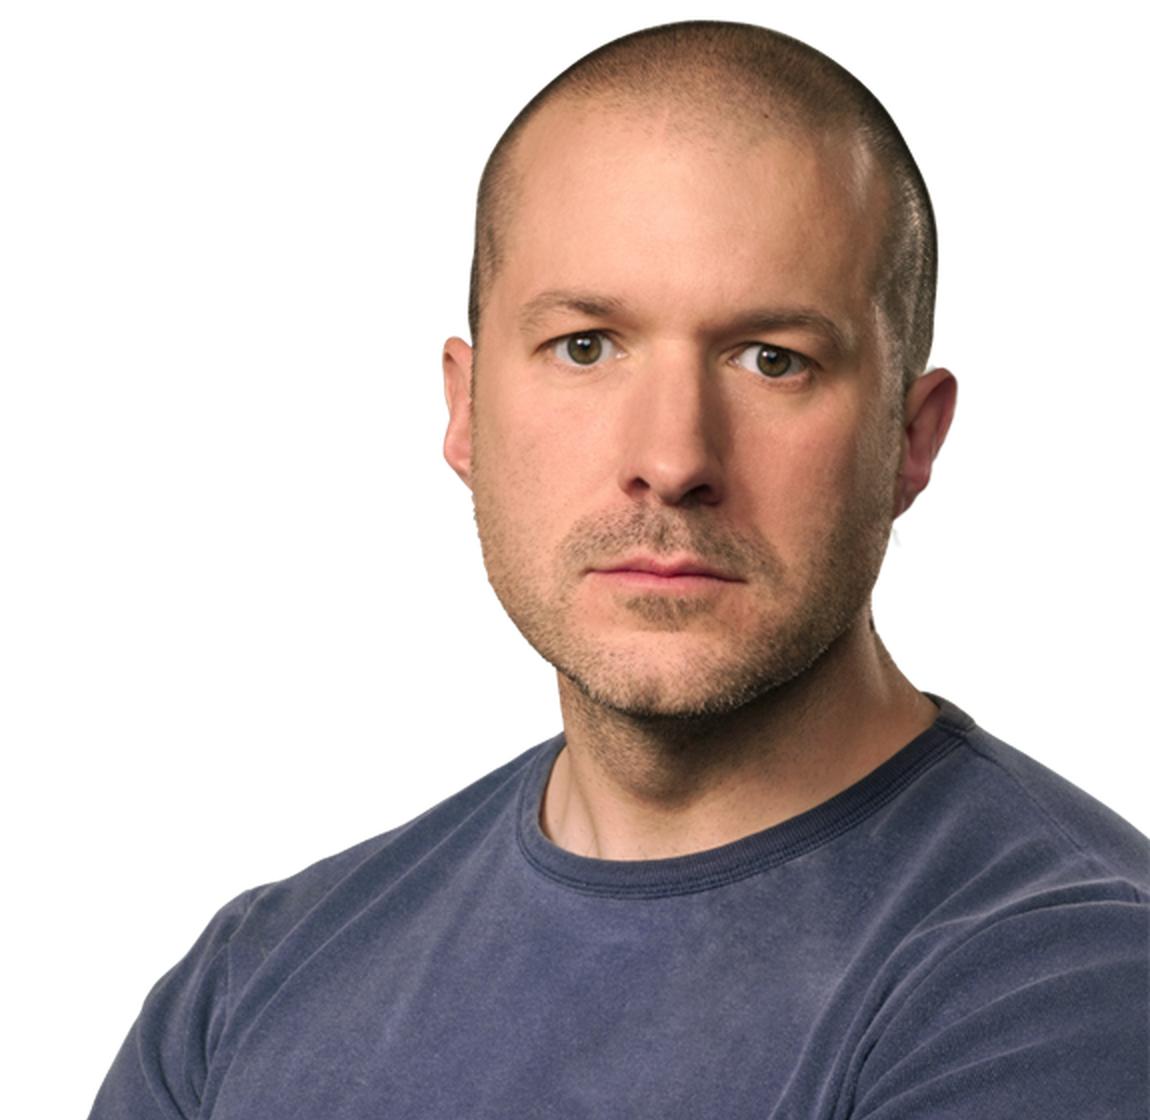 jony ive apple chief design officer